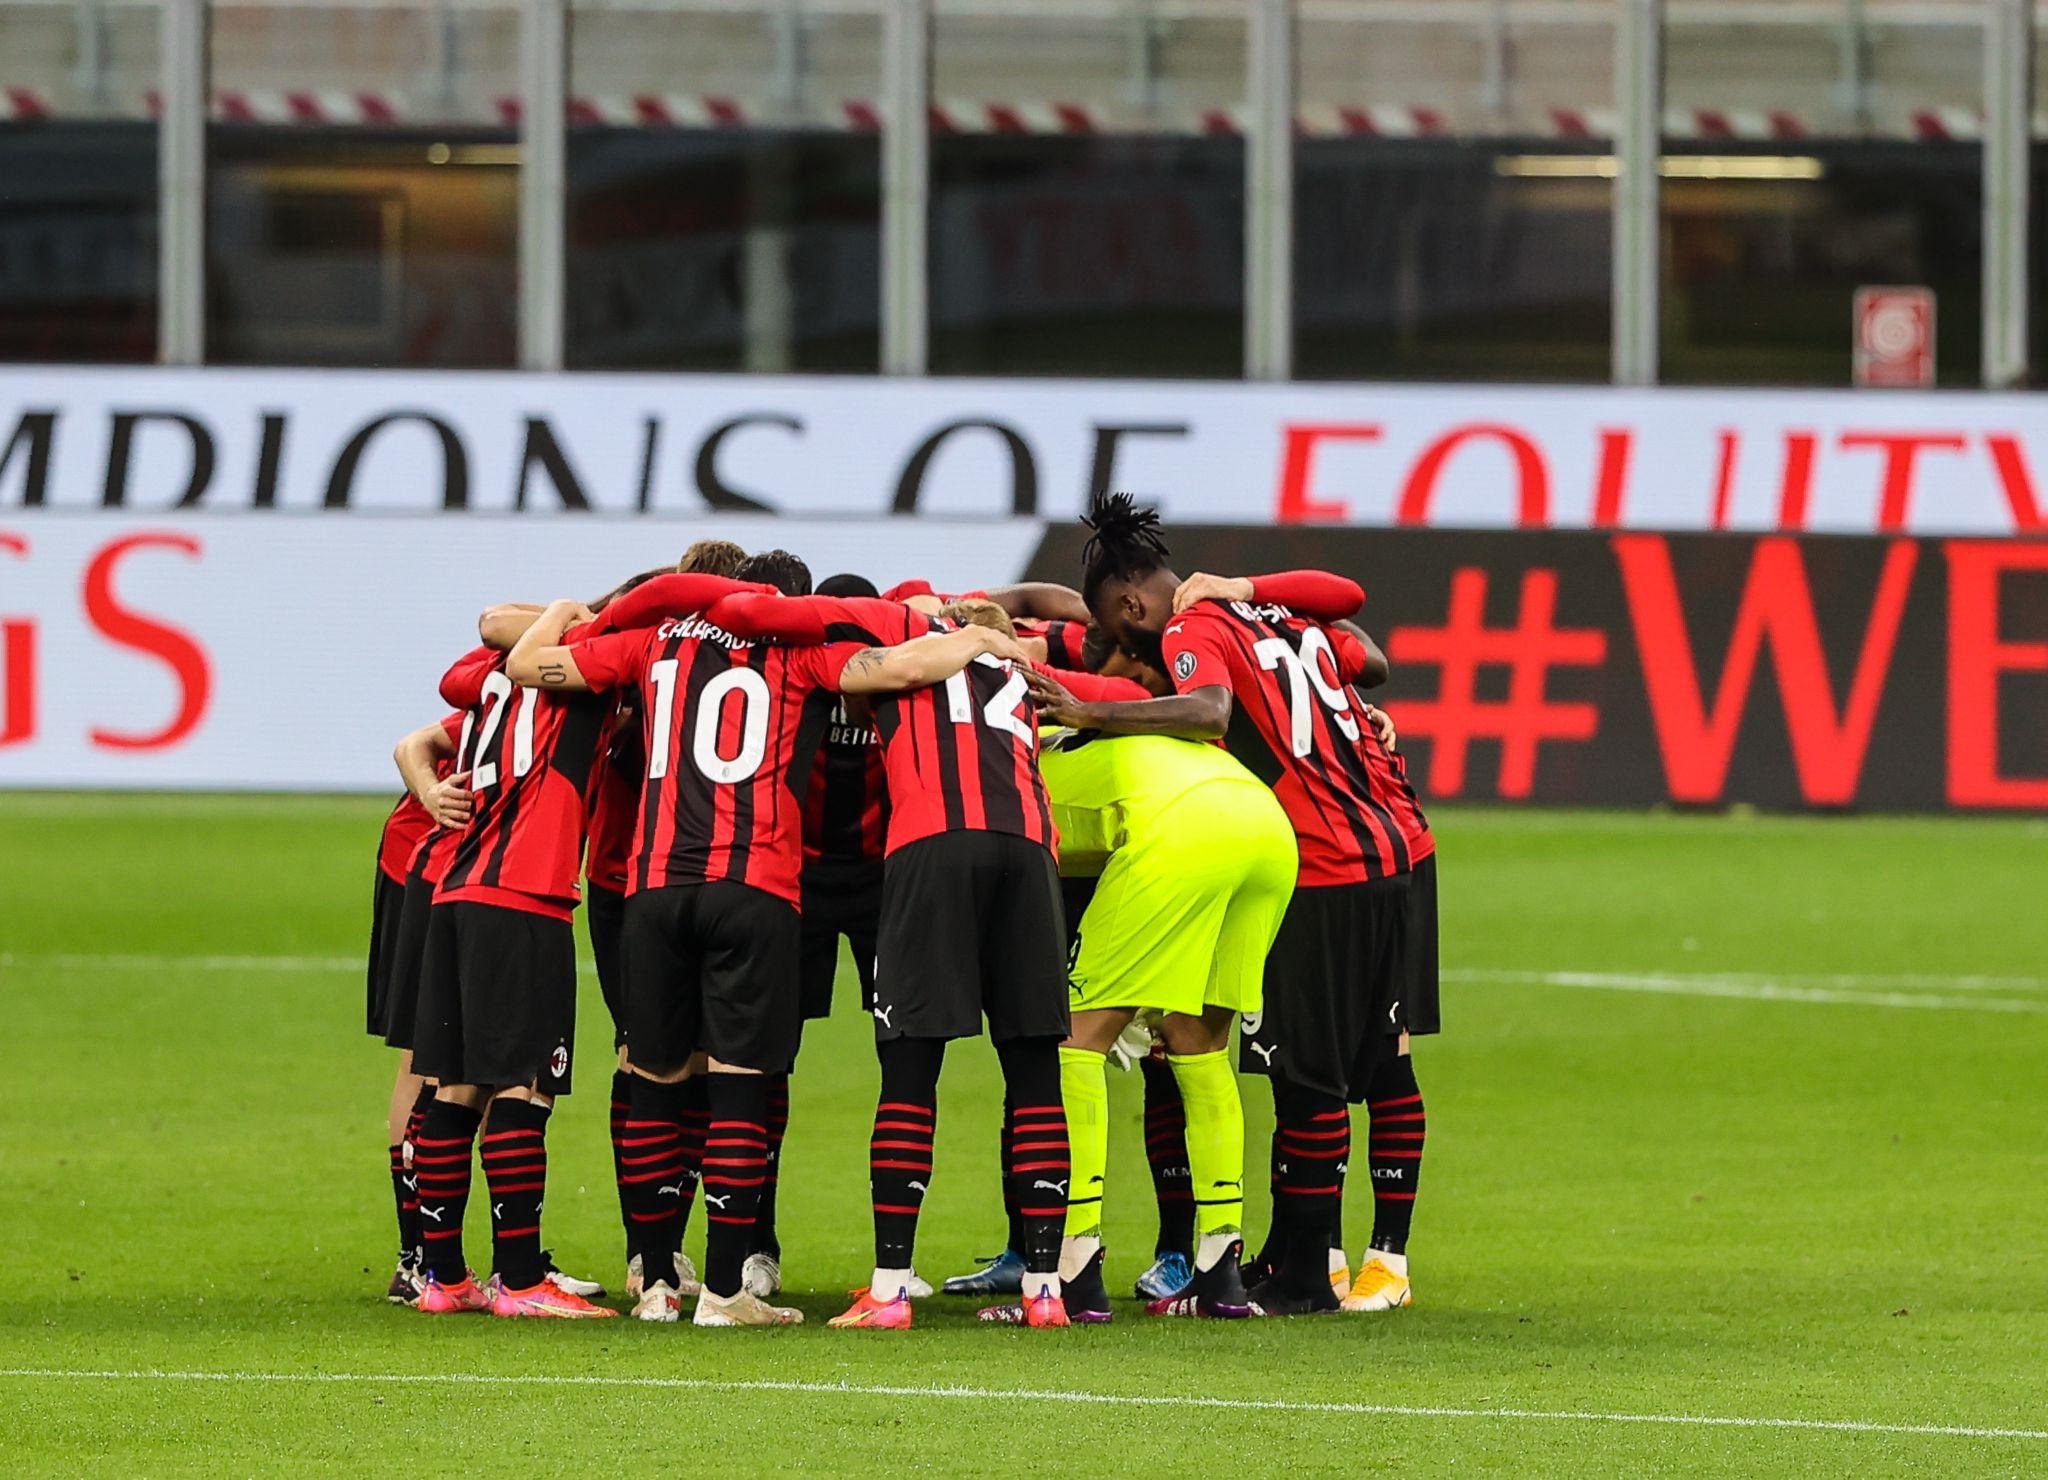 La squadra del Milan (Photo Credit: Agenzia Fotogramma)